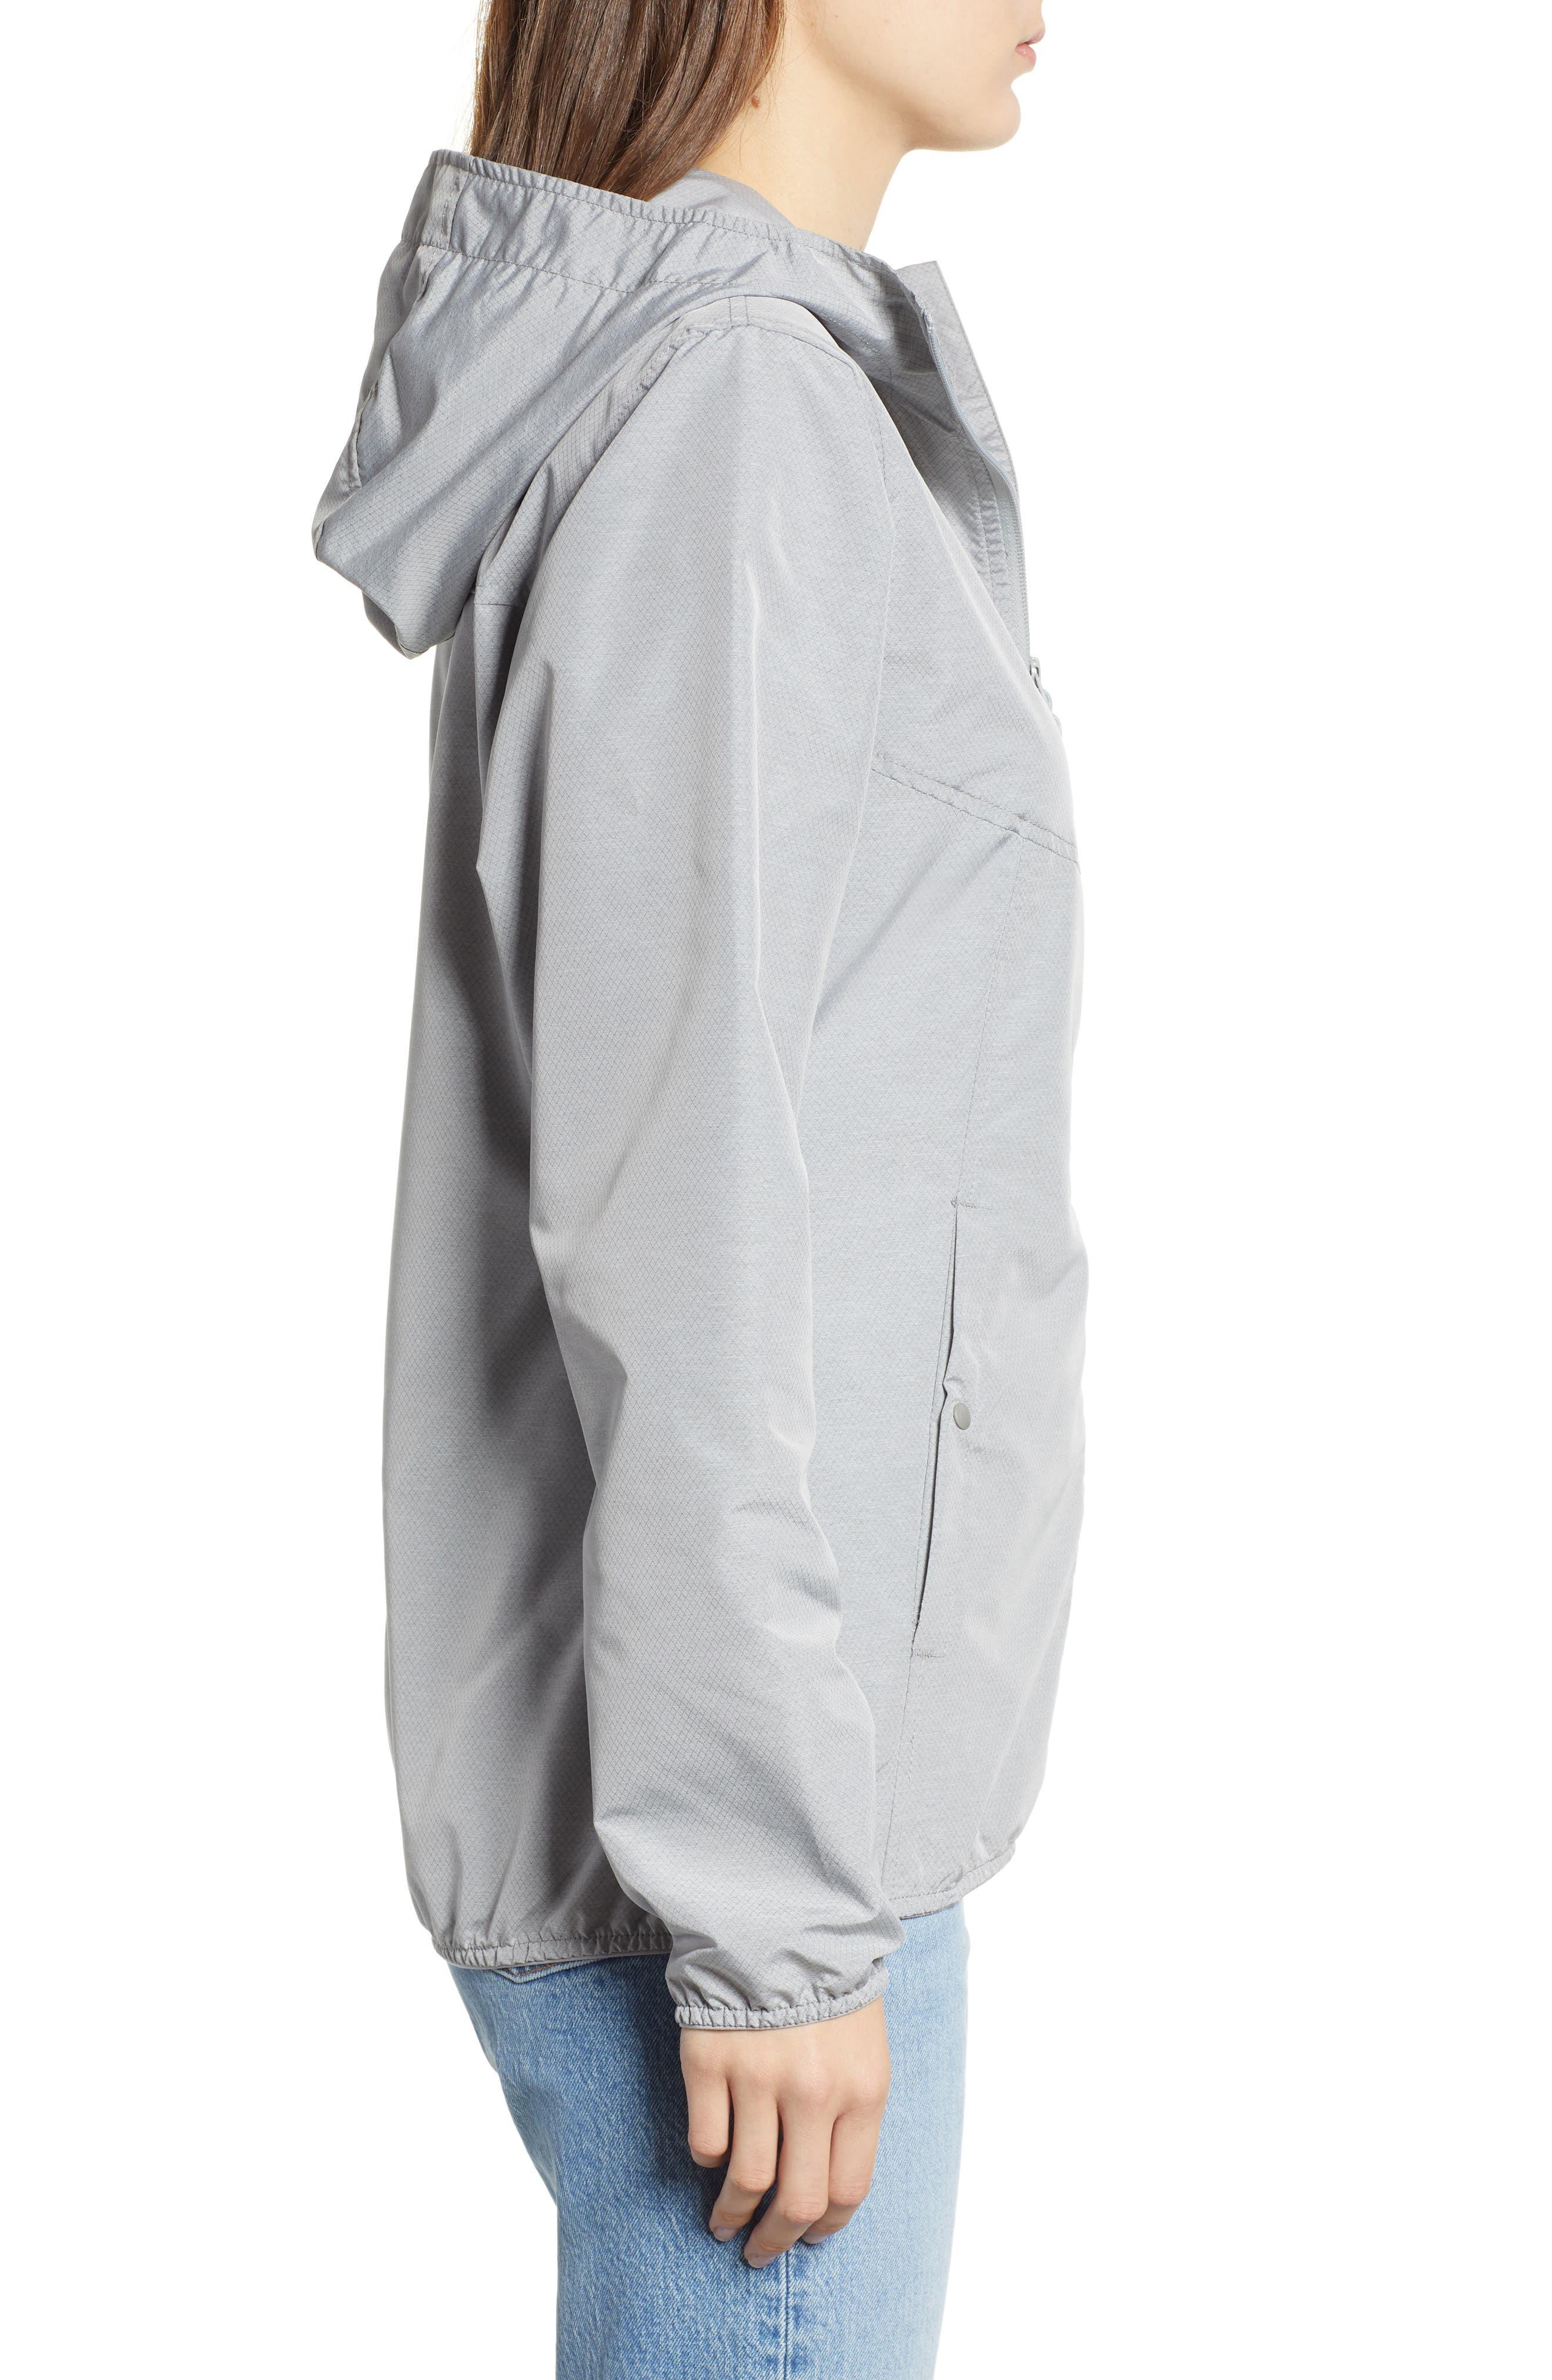 oyage Wind Hooded Jacket,                             Alternate thumbnail 3, color,                             LIGHT GREY CROSSHATCH